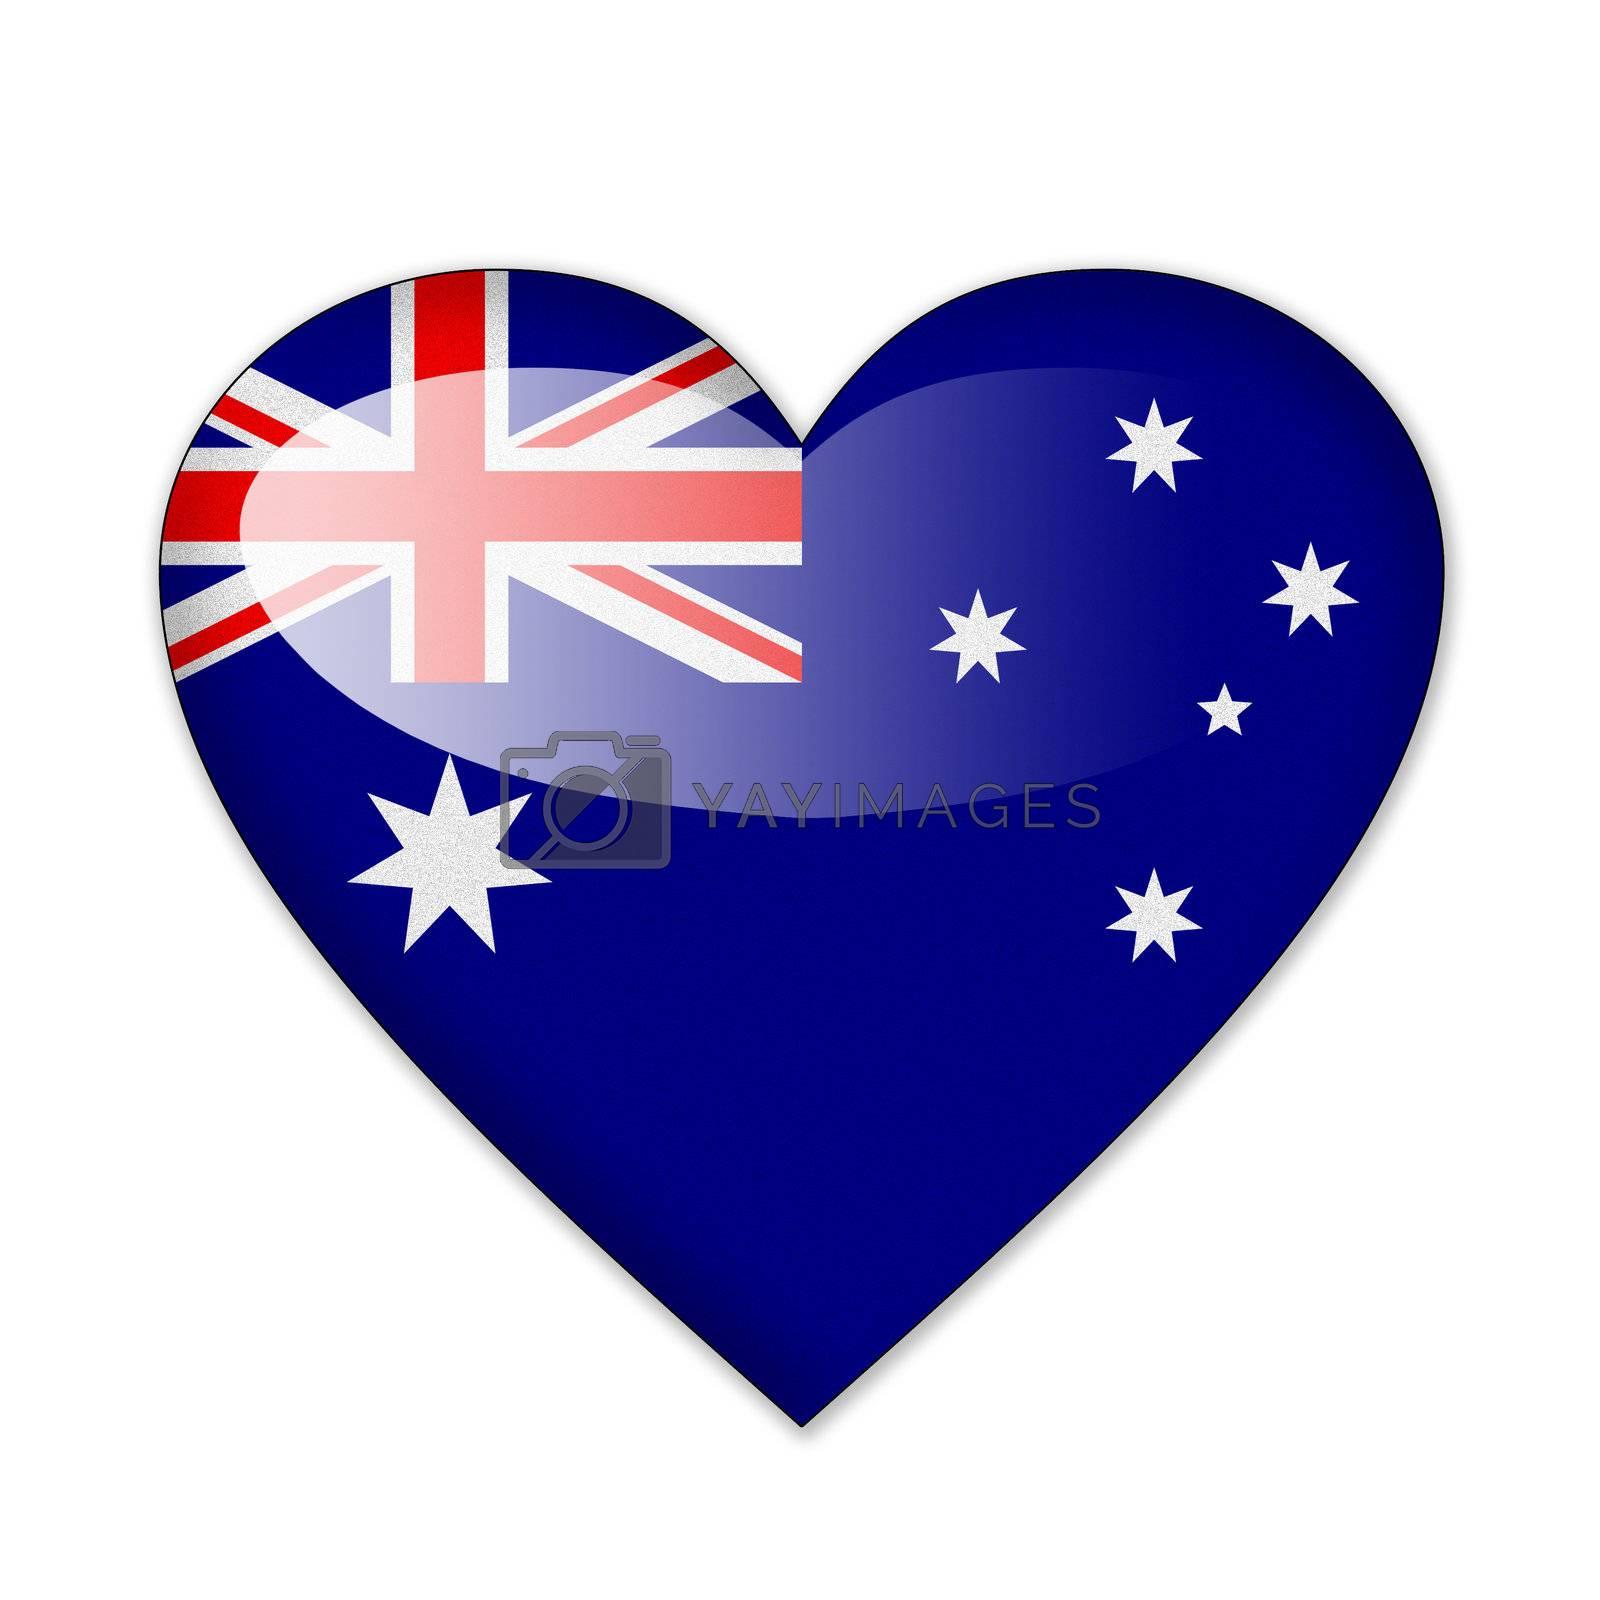 Australia flag in heart shape isolated on white background